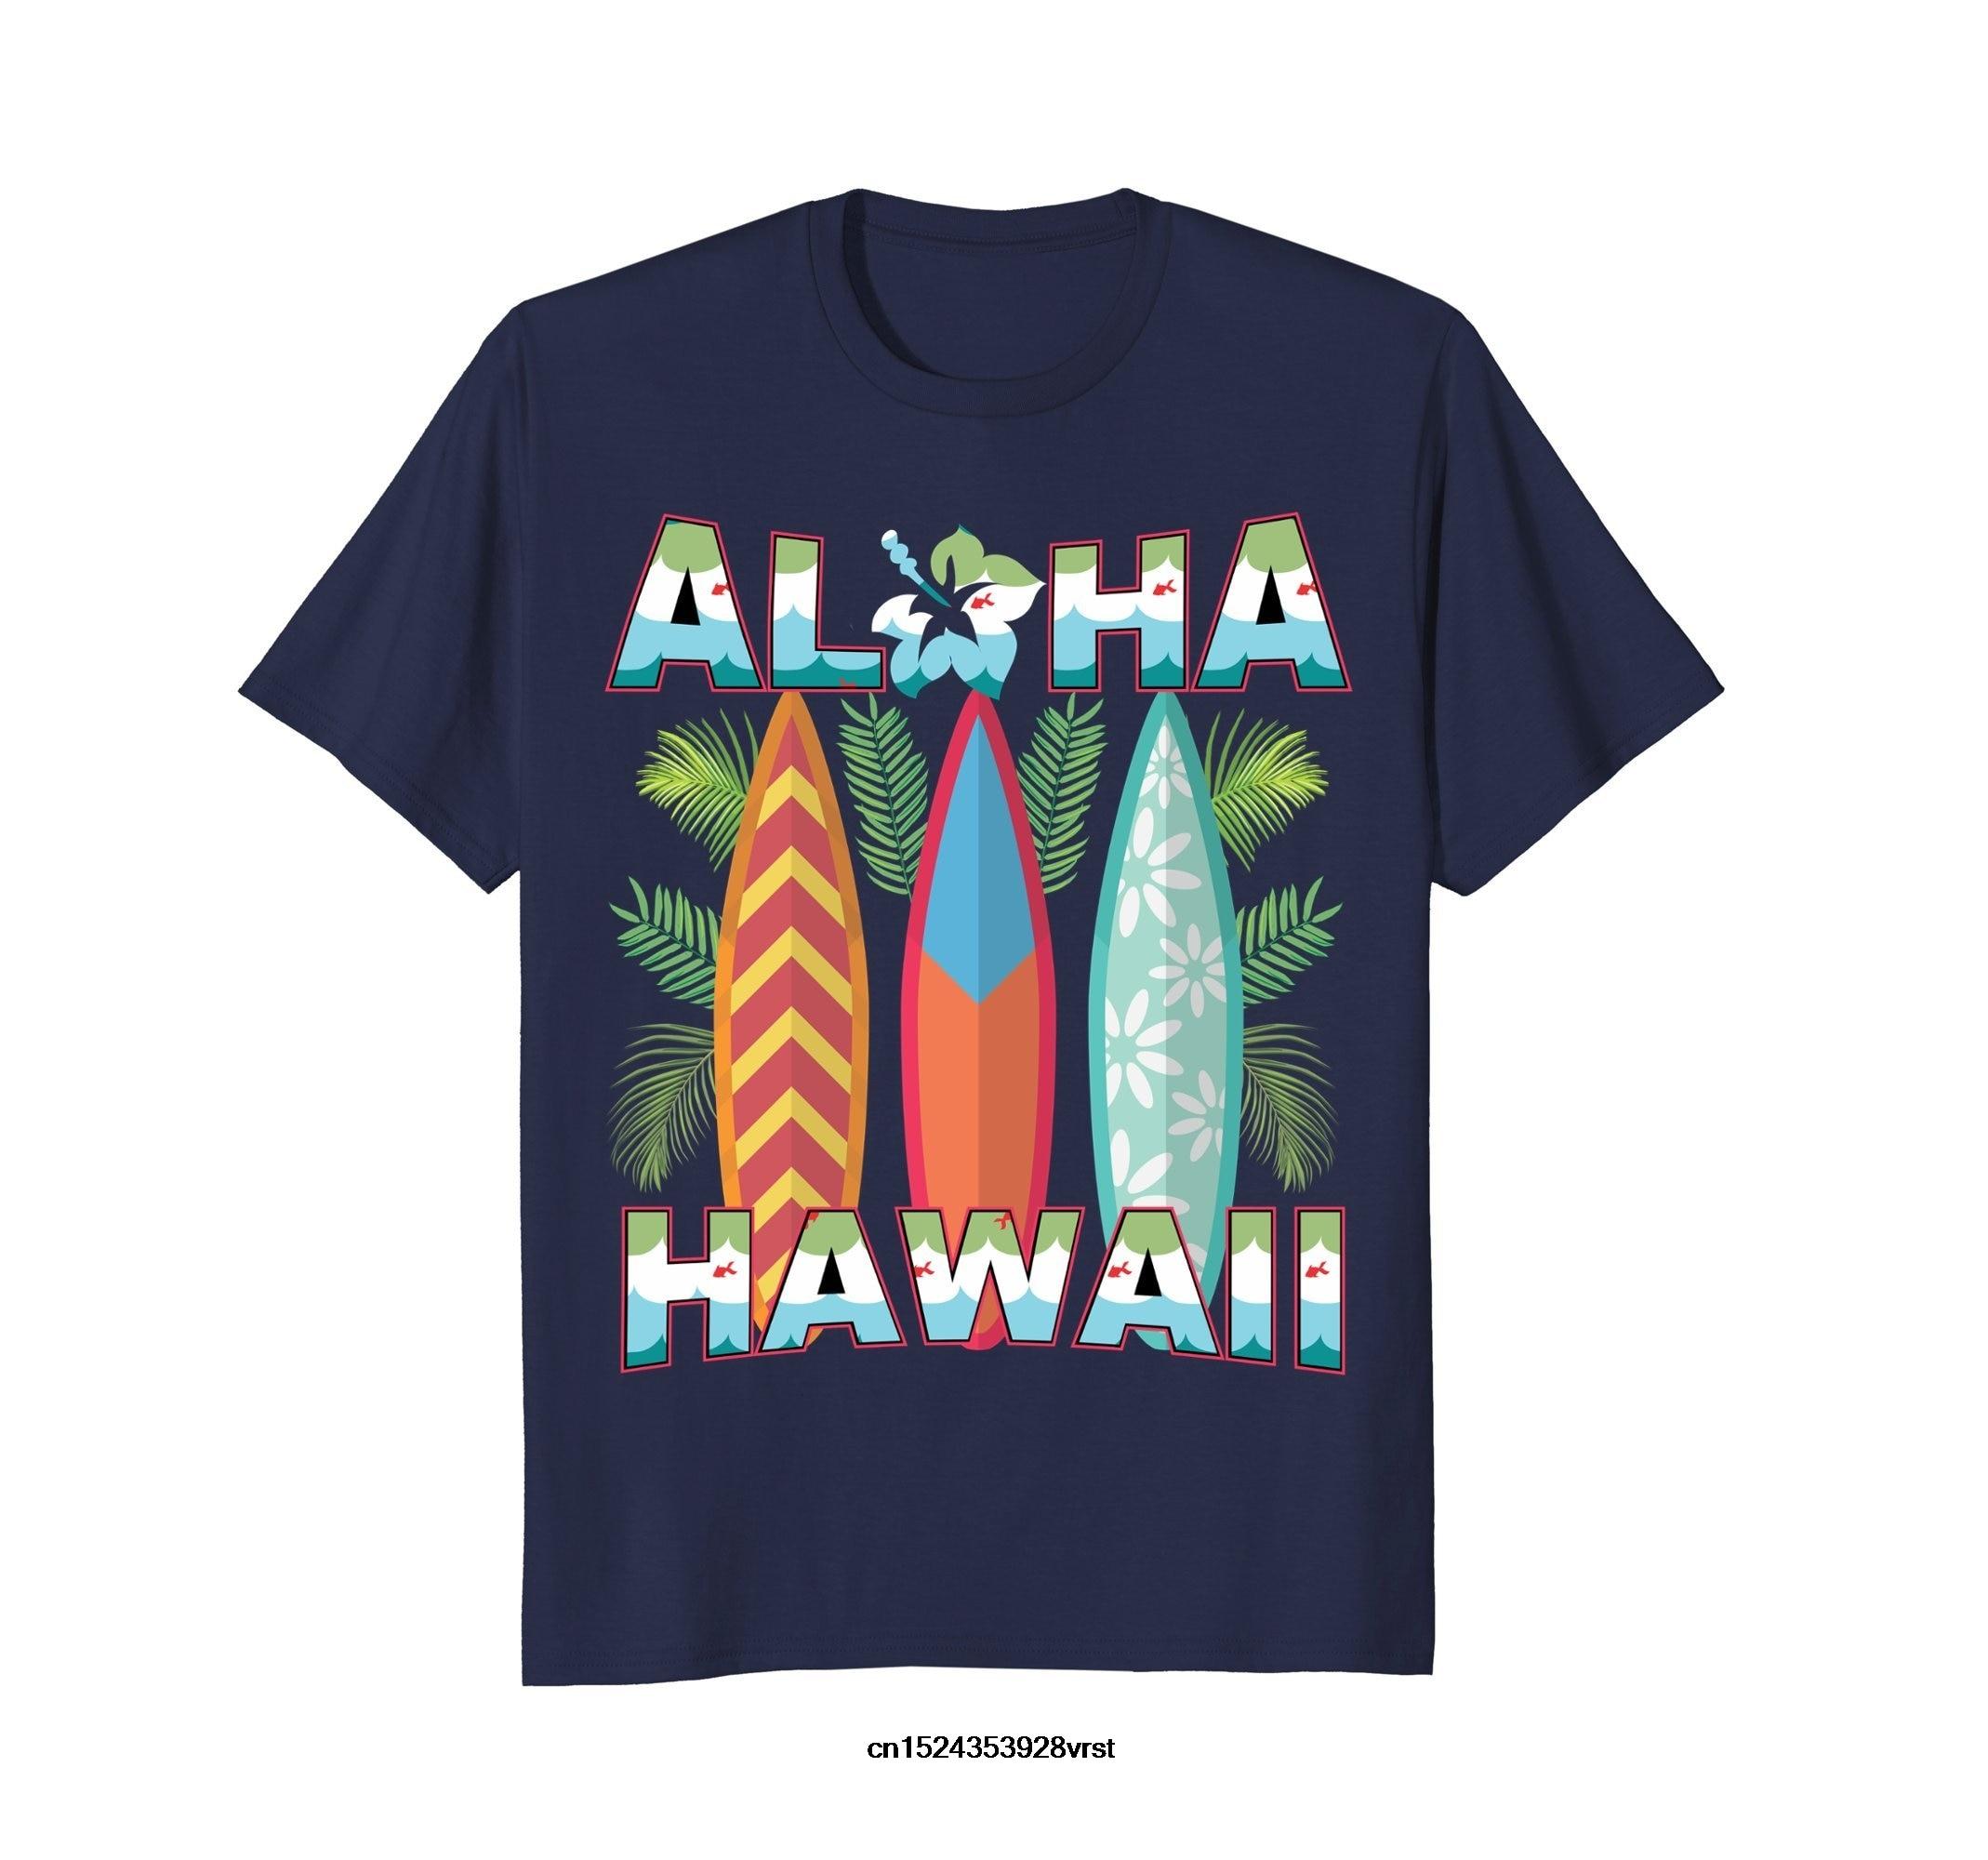 4958025171c6 Buy hawaiian t shirts and get free shipping on AliExpress.com